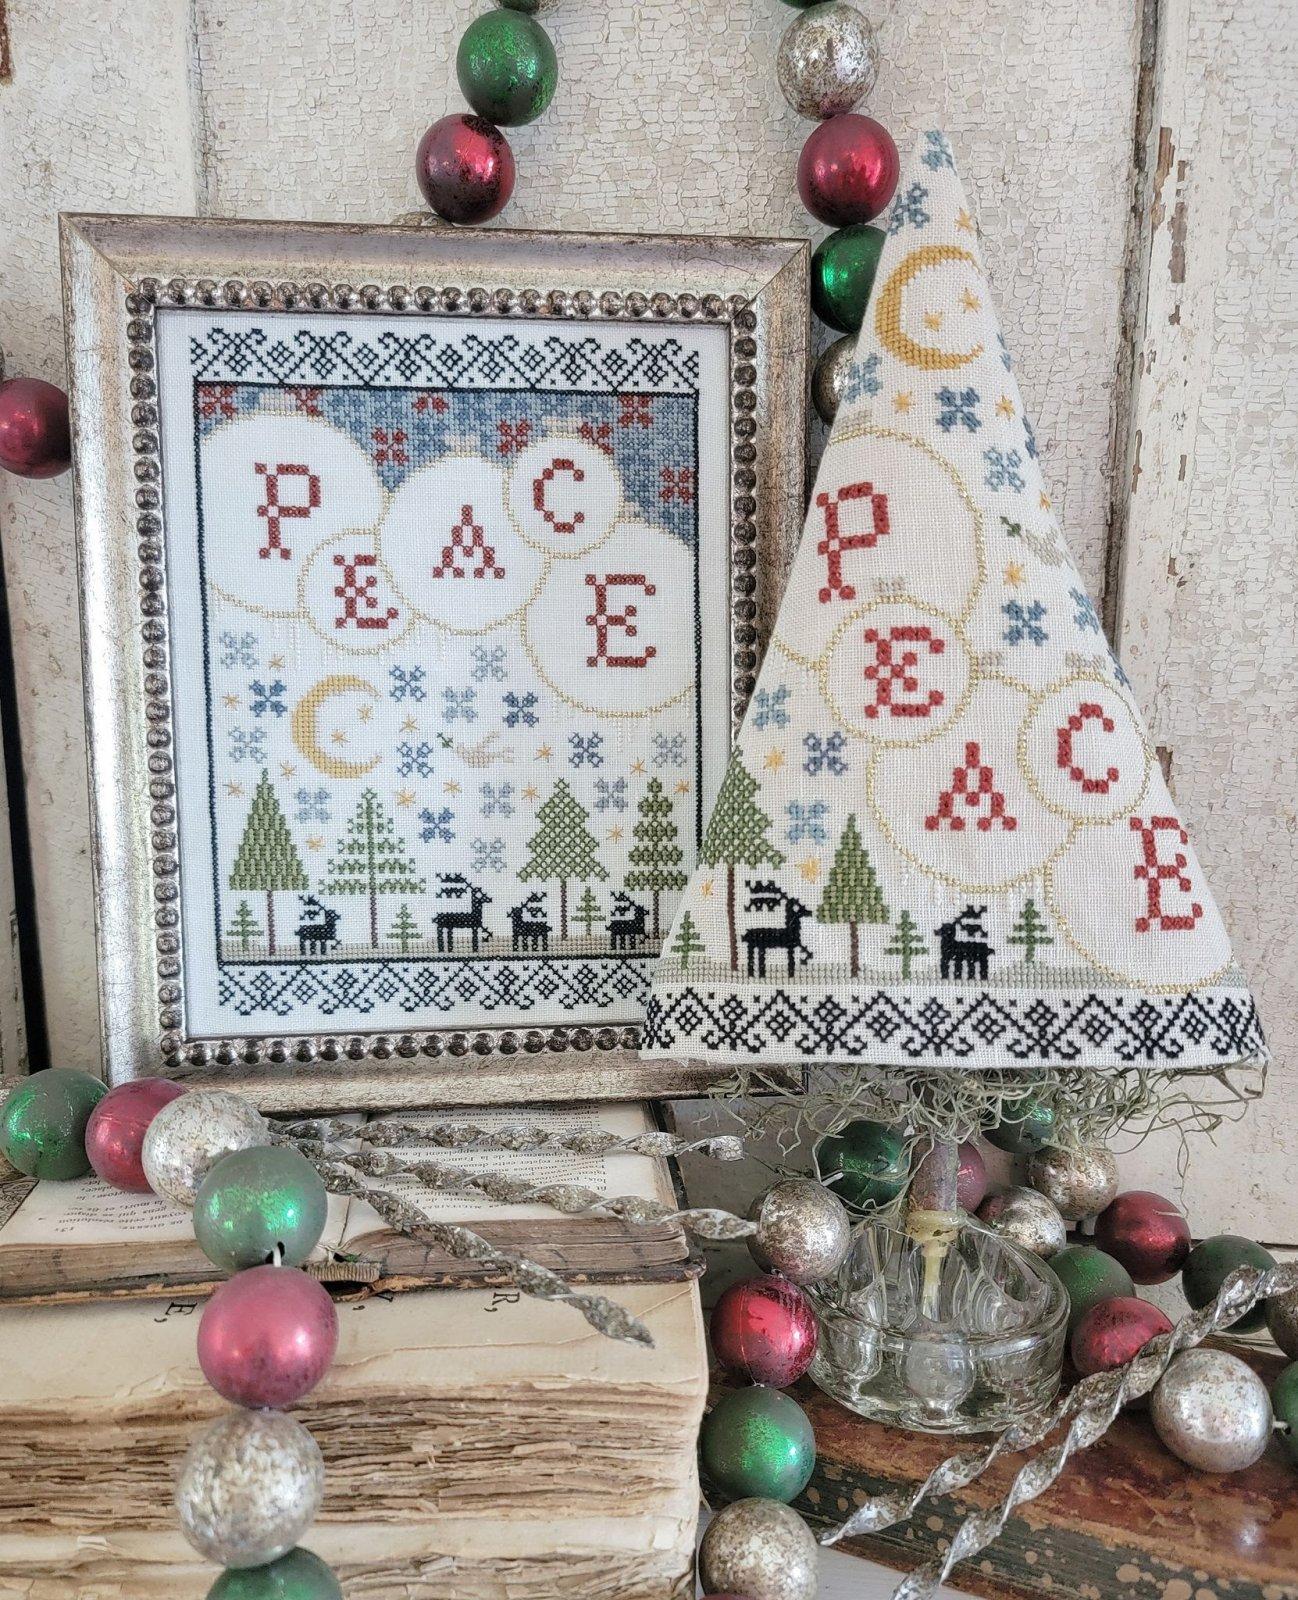 Fifth Day of Christmas Sampler and Tree chart - Hello from Liz Mathews